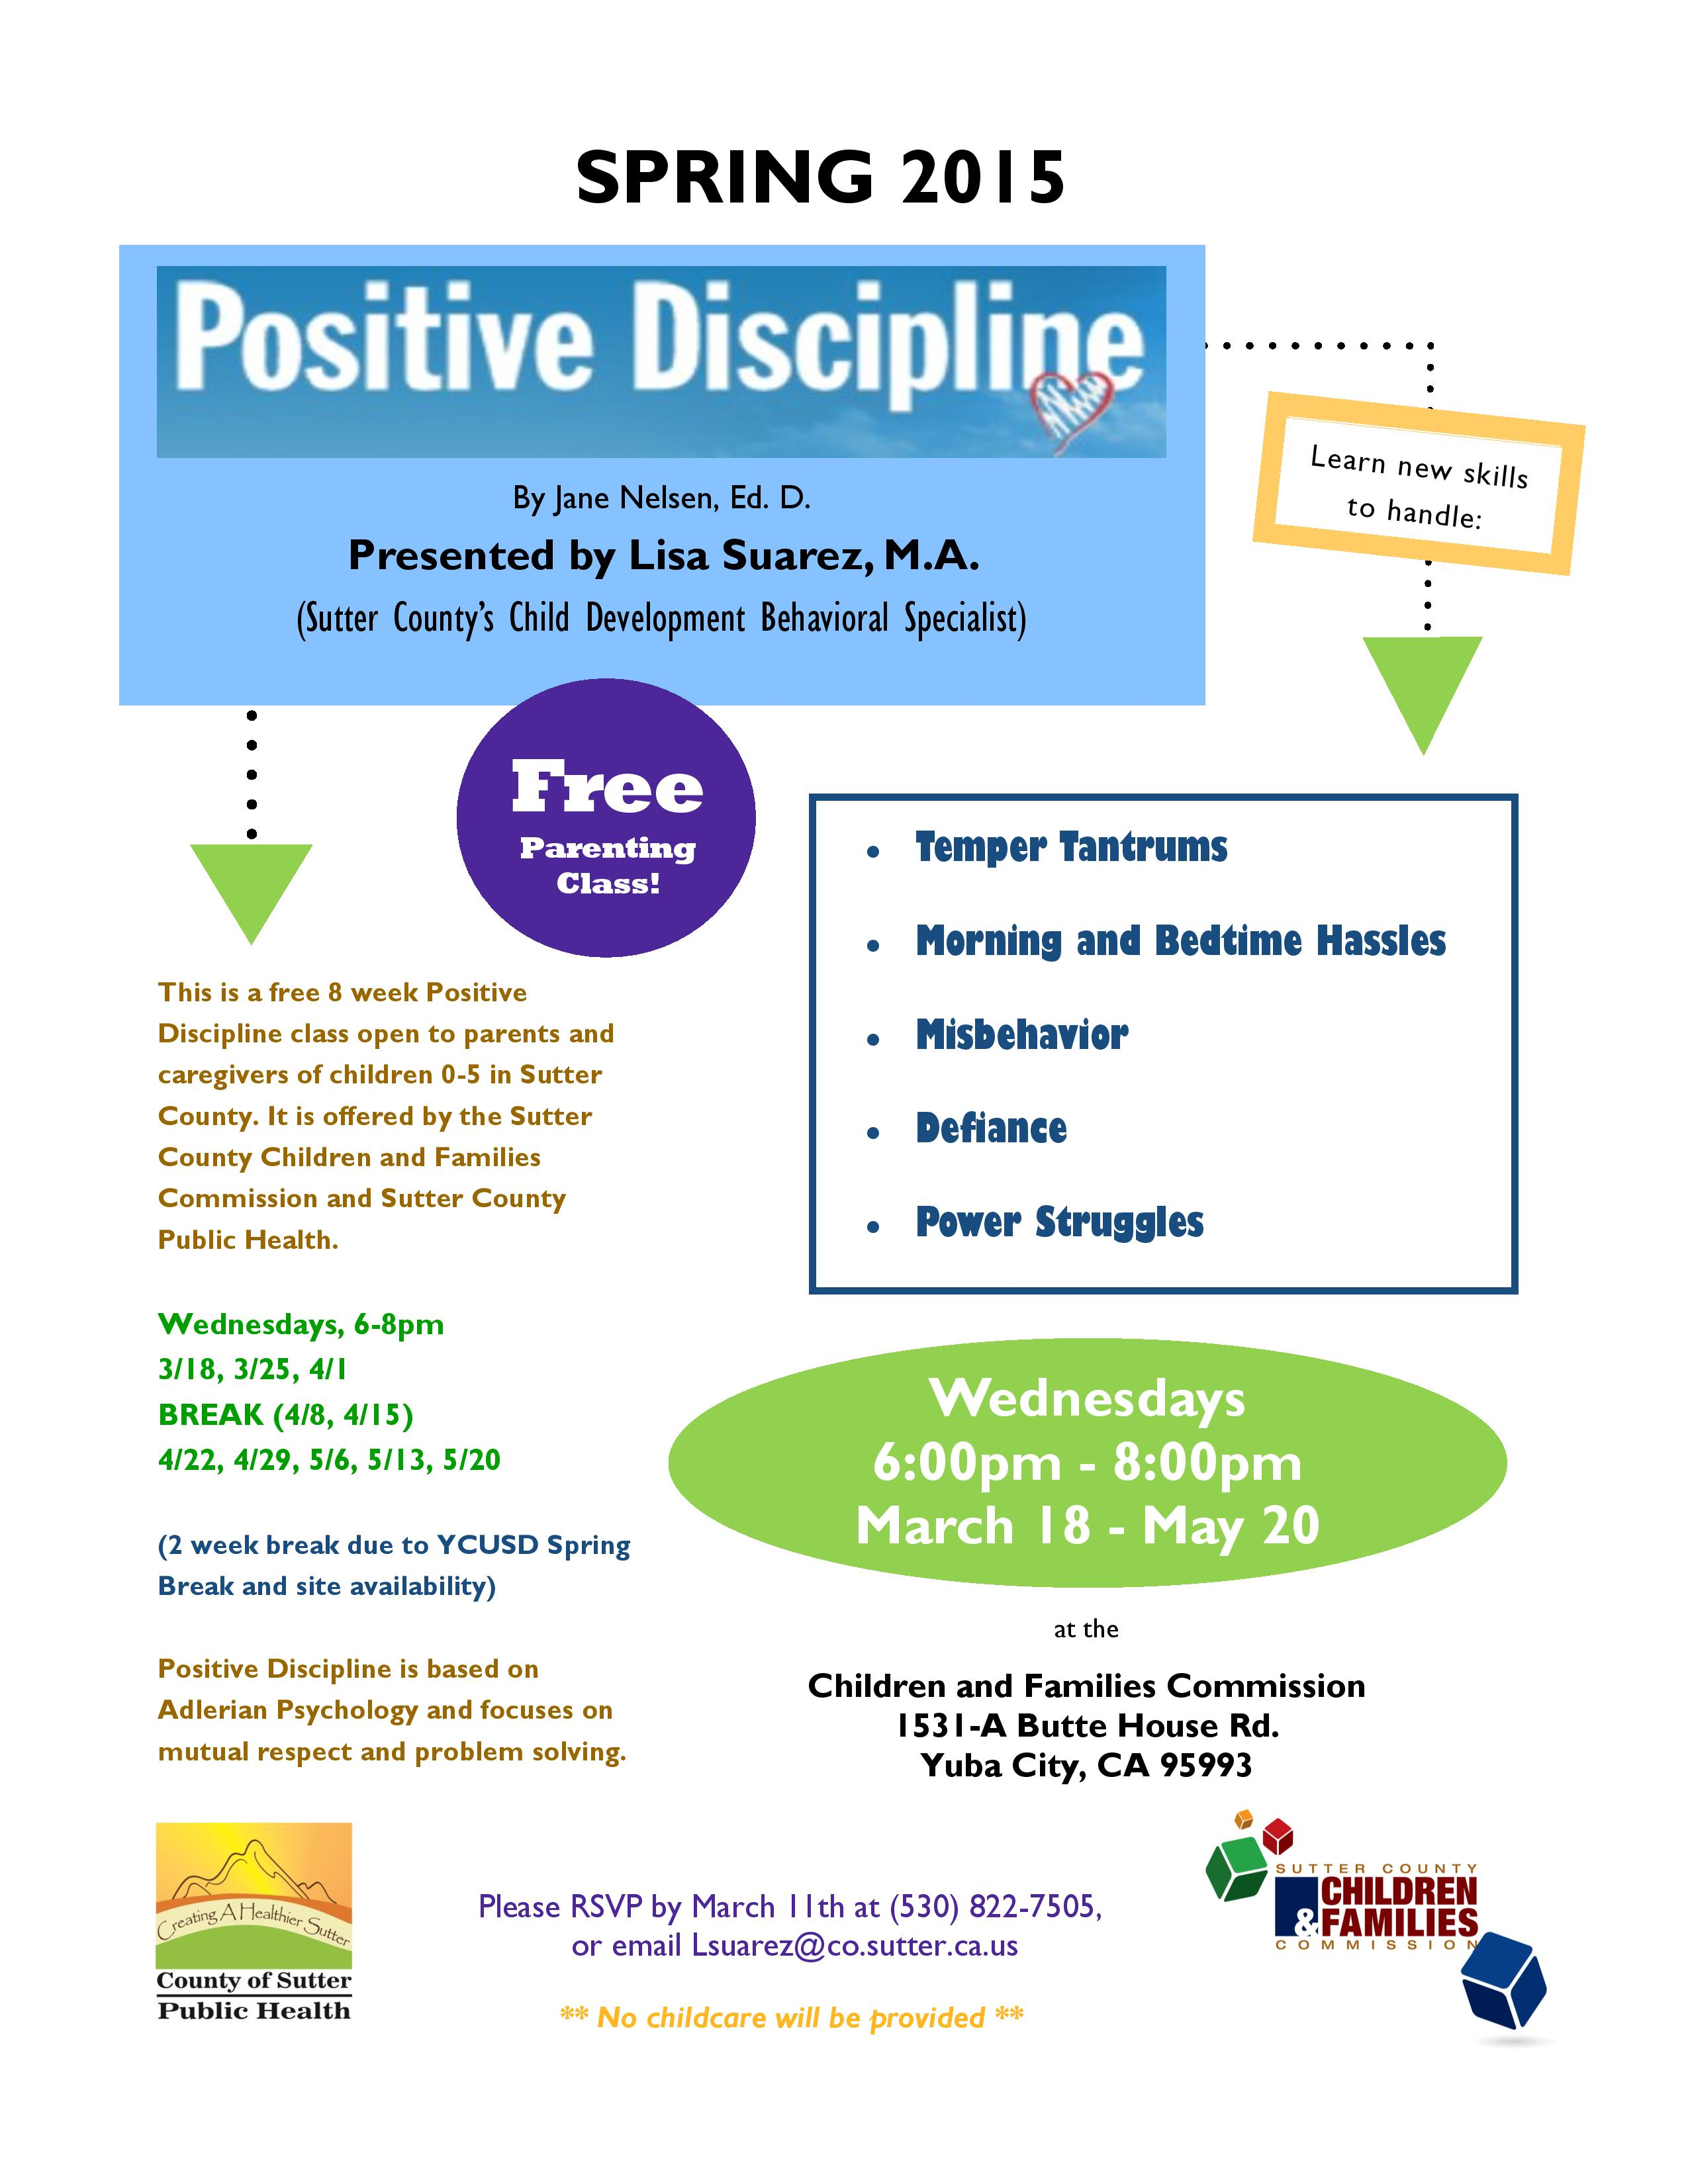 Positive Discipline Spring 2015